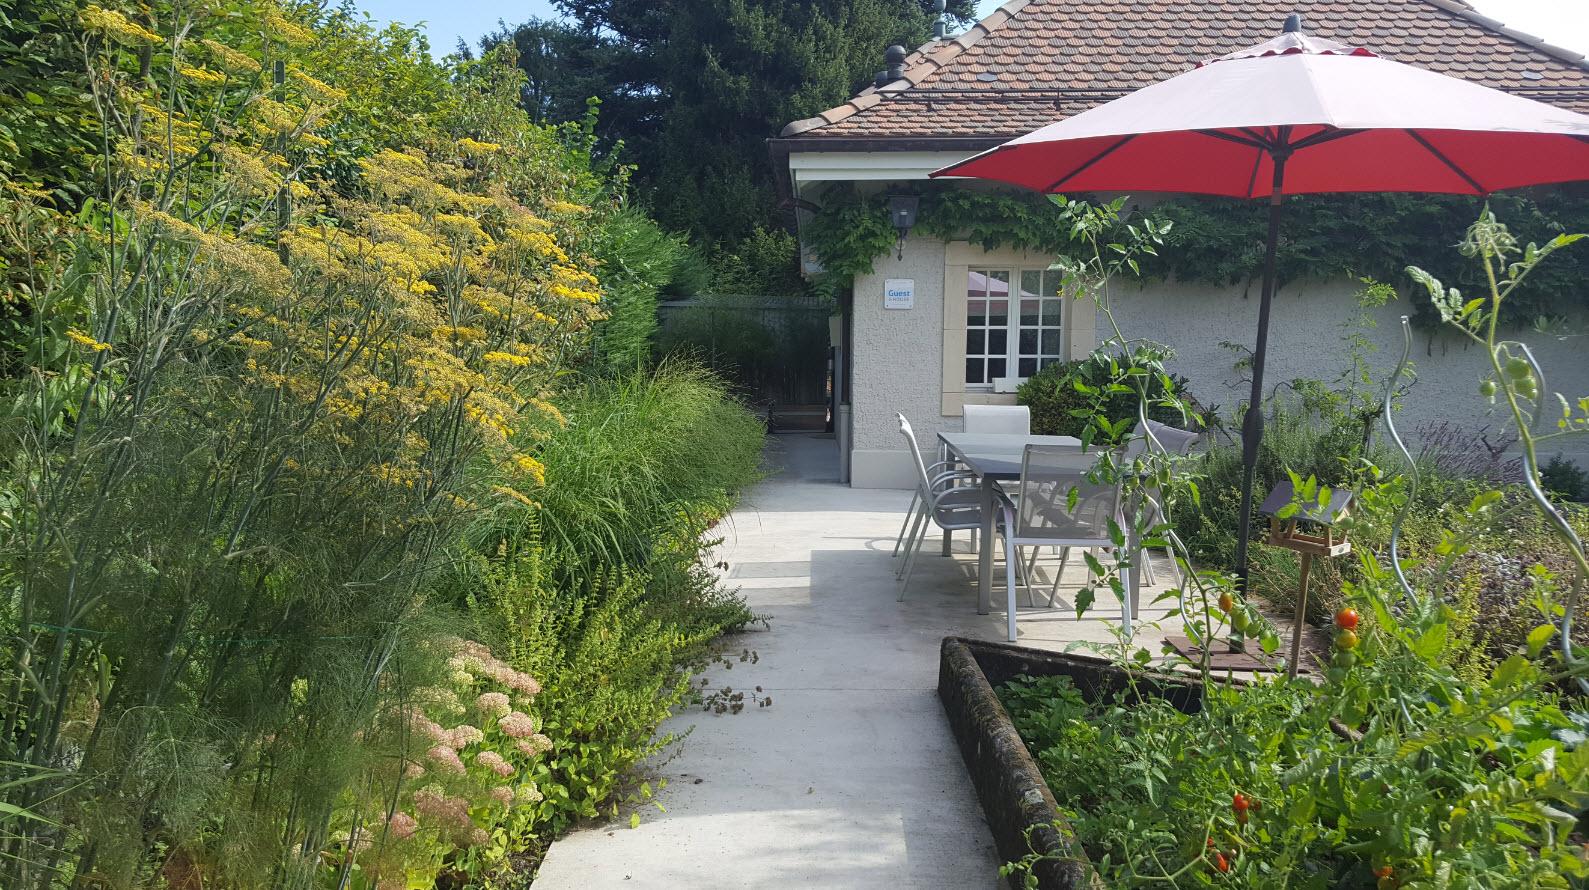 Jardin bed and breakfast Suisse